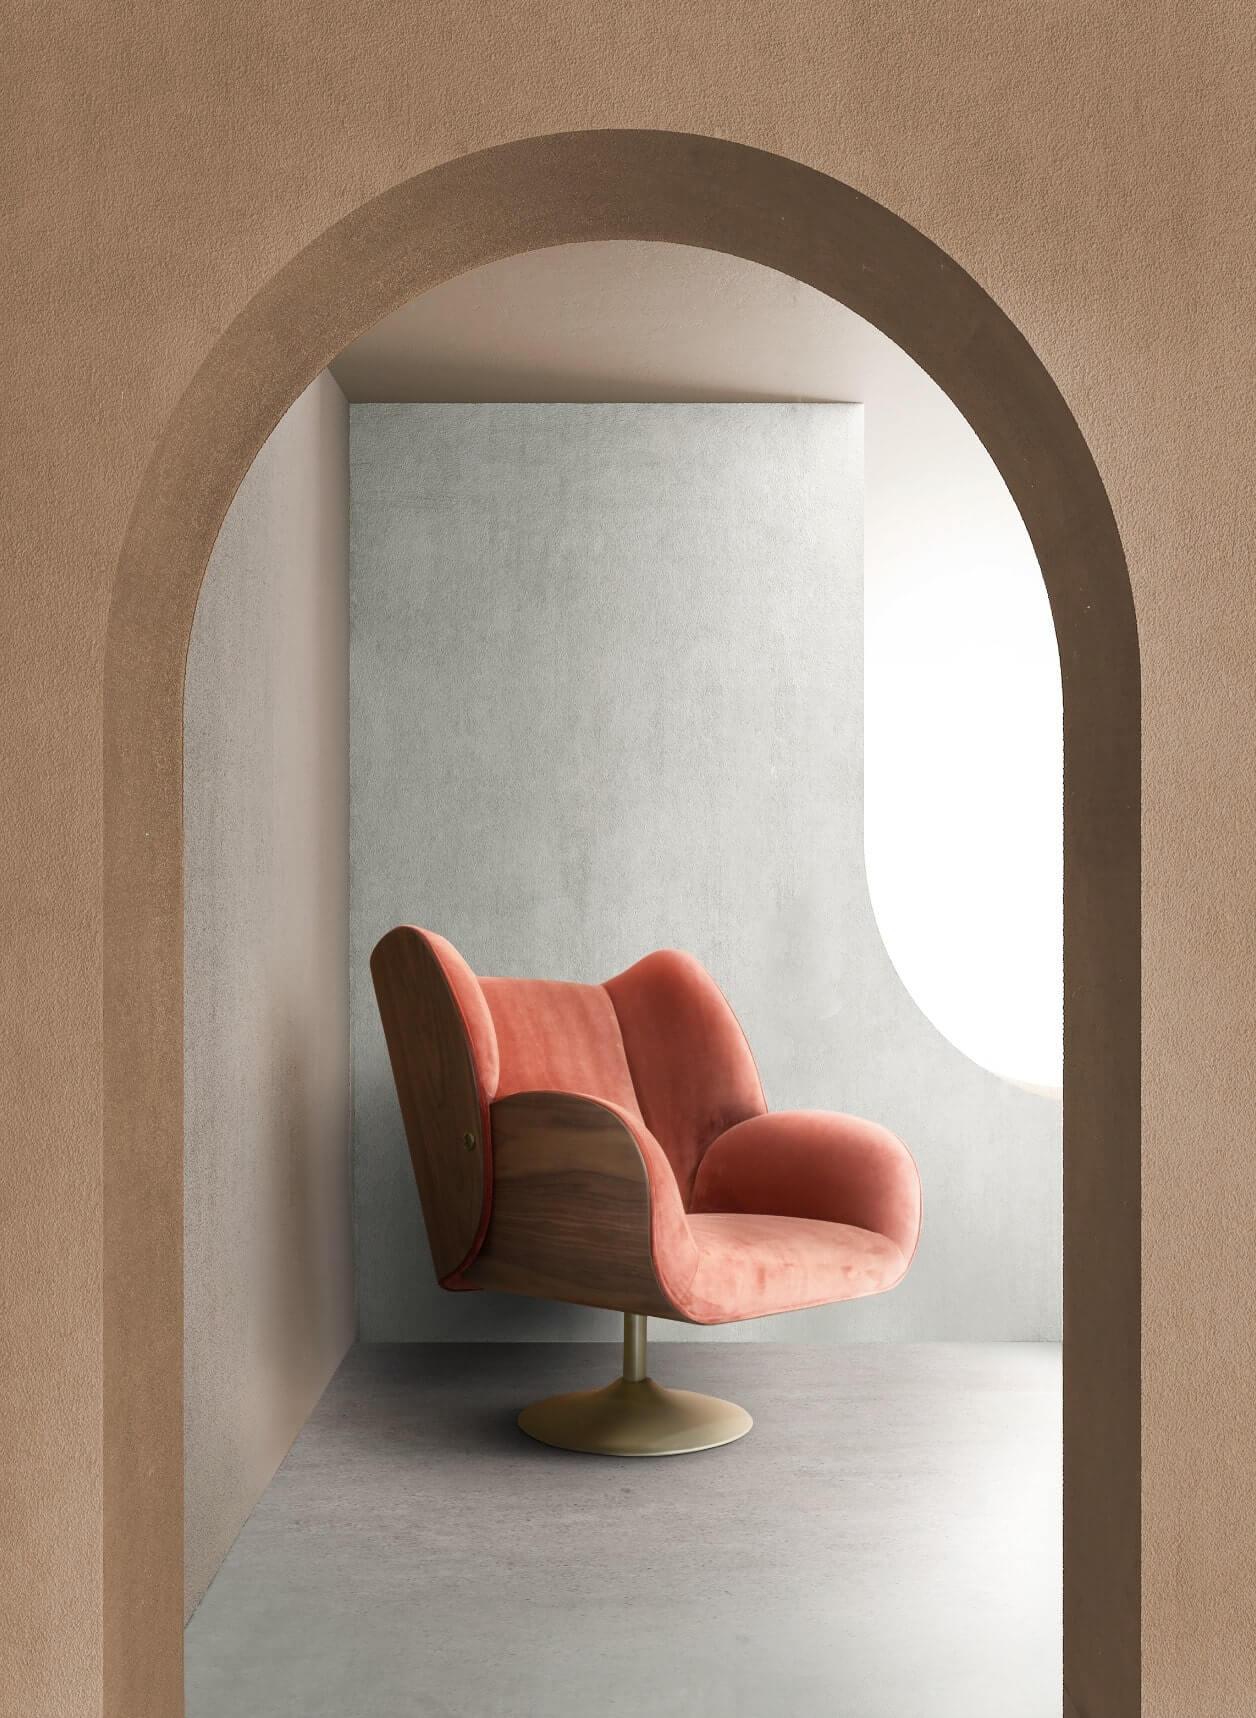 the-perfect-living-corner-_-studiopepe-x-essential-home-1